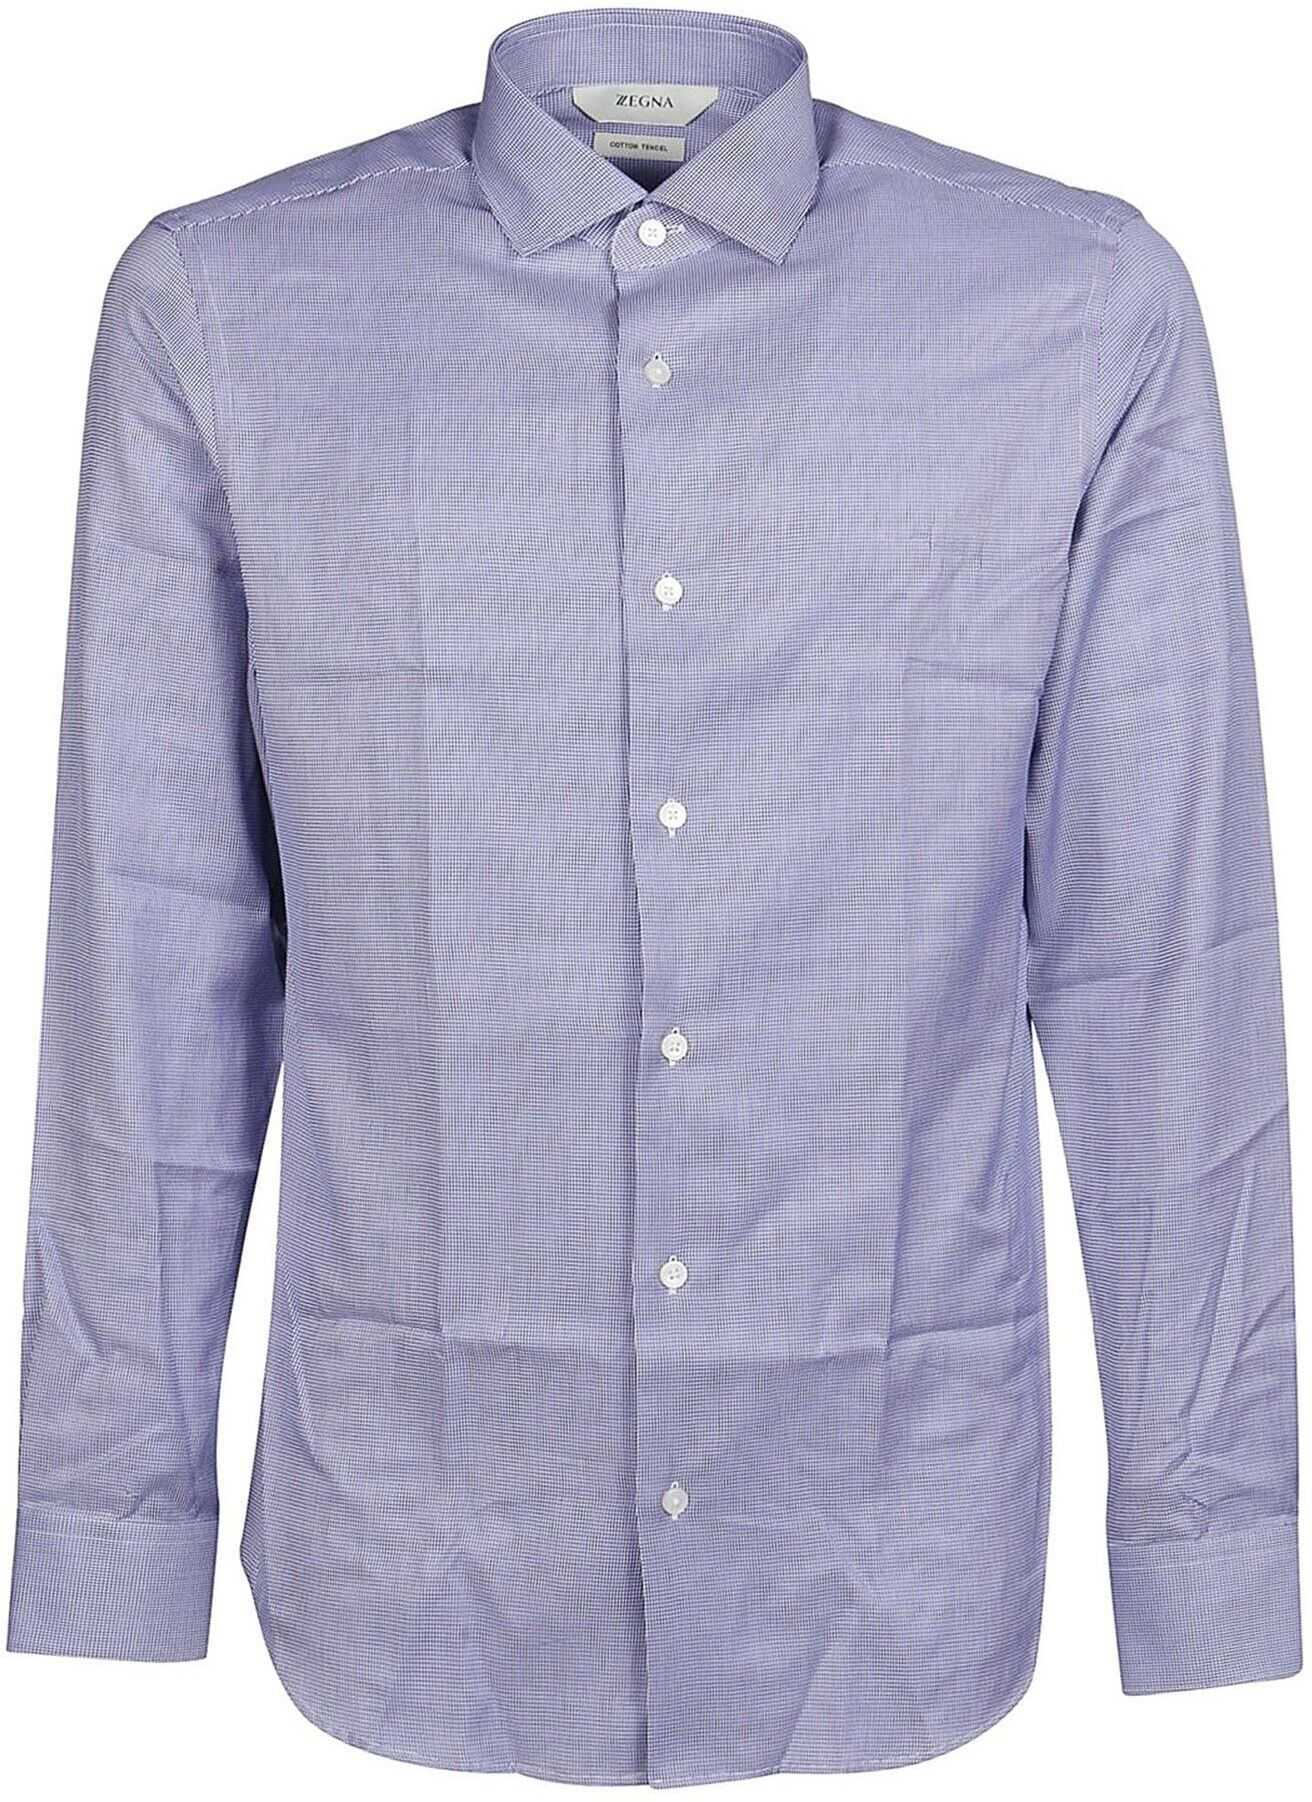 Z Zegna Micro Check Cotton Shirt In Light Blue Light Blue imagine